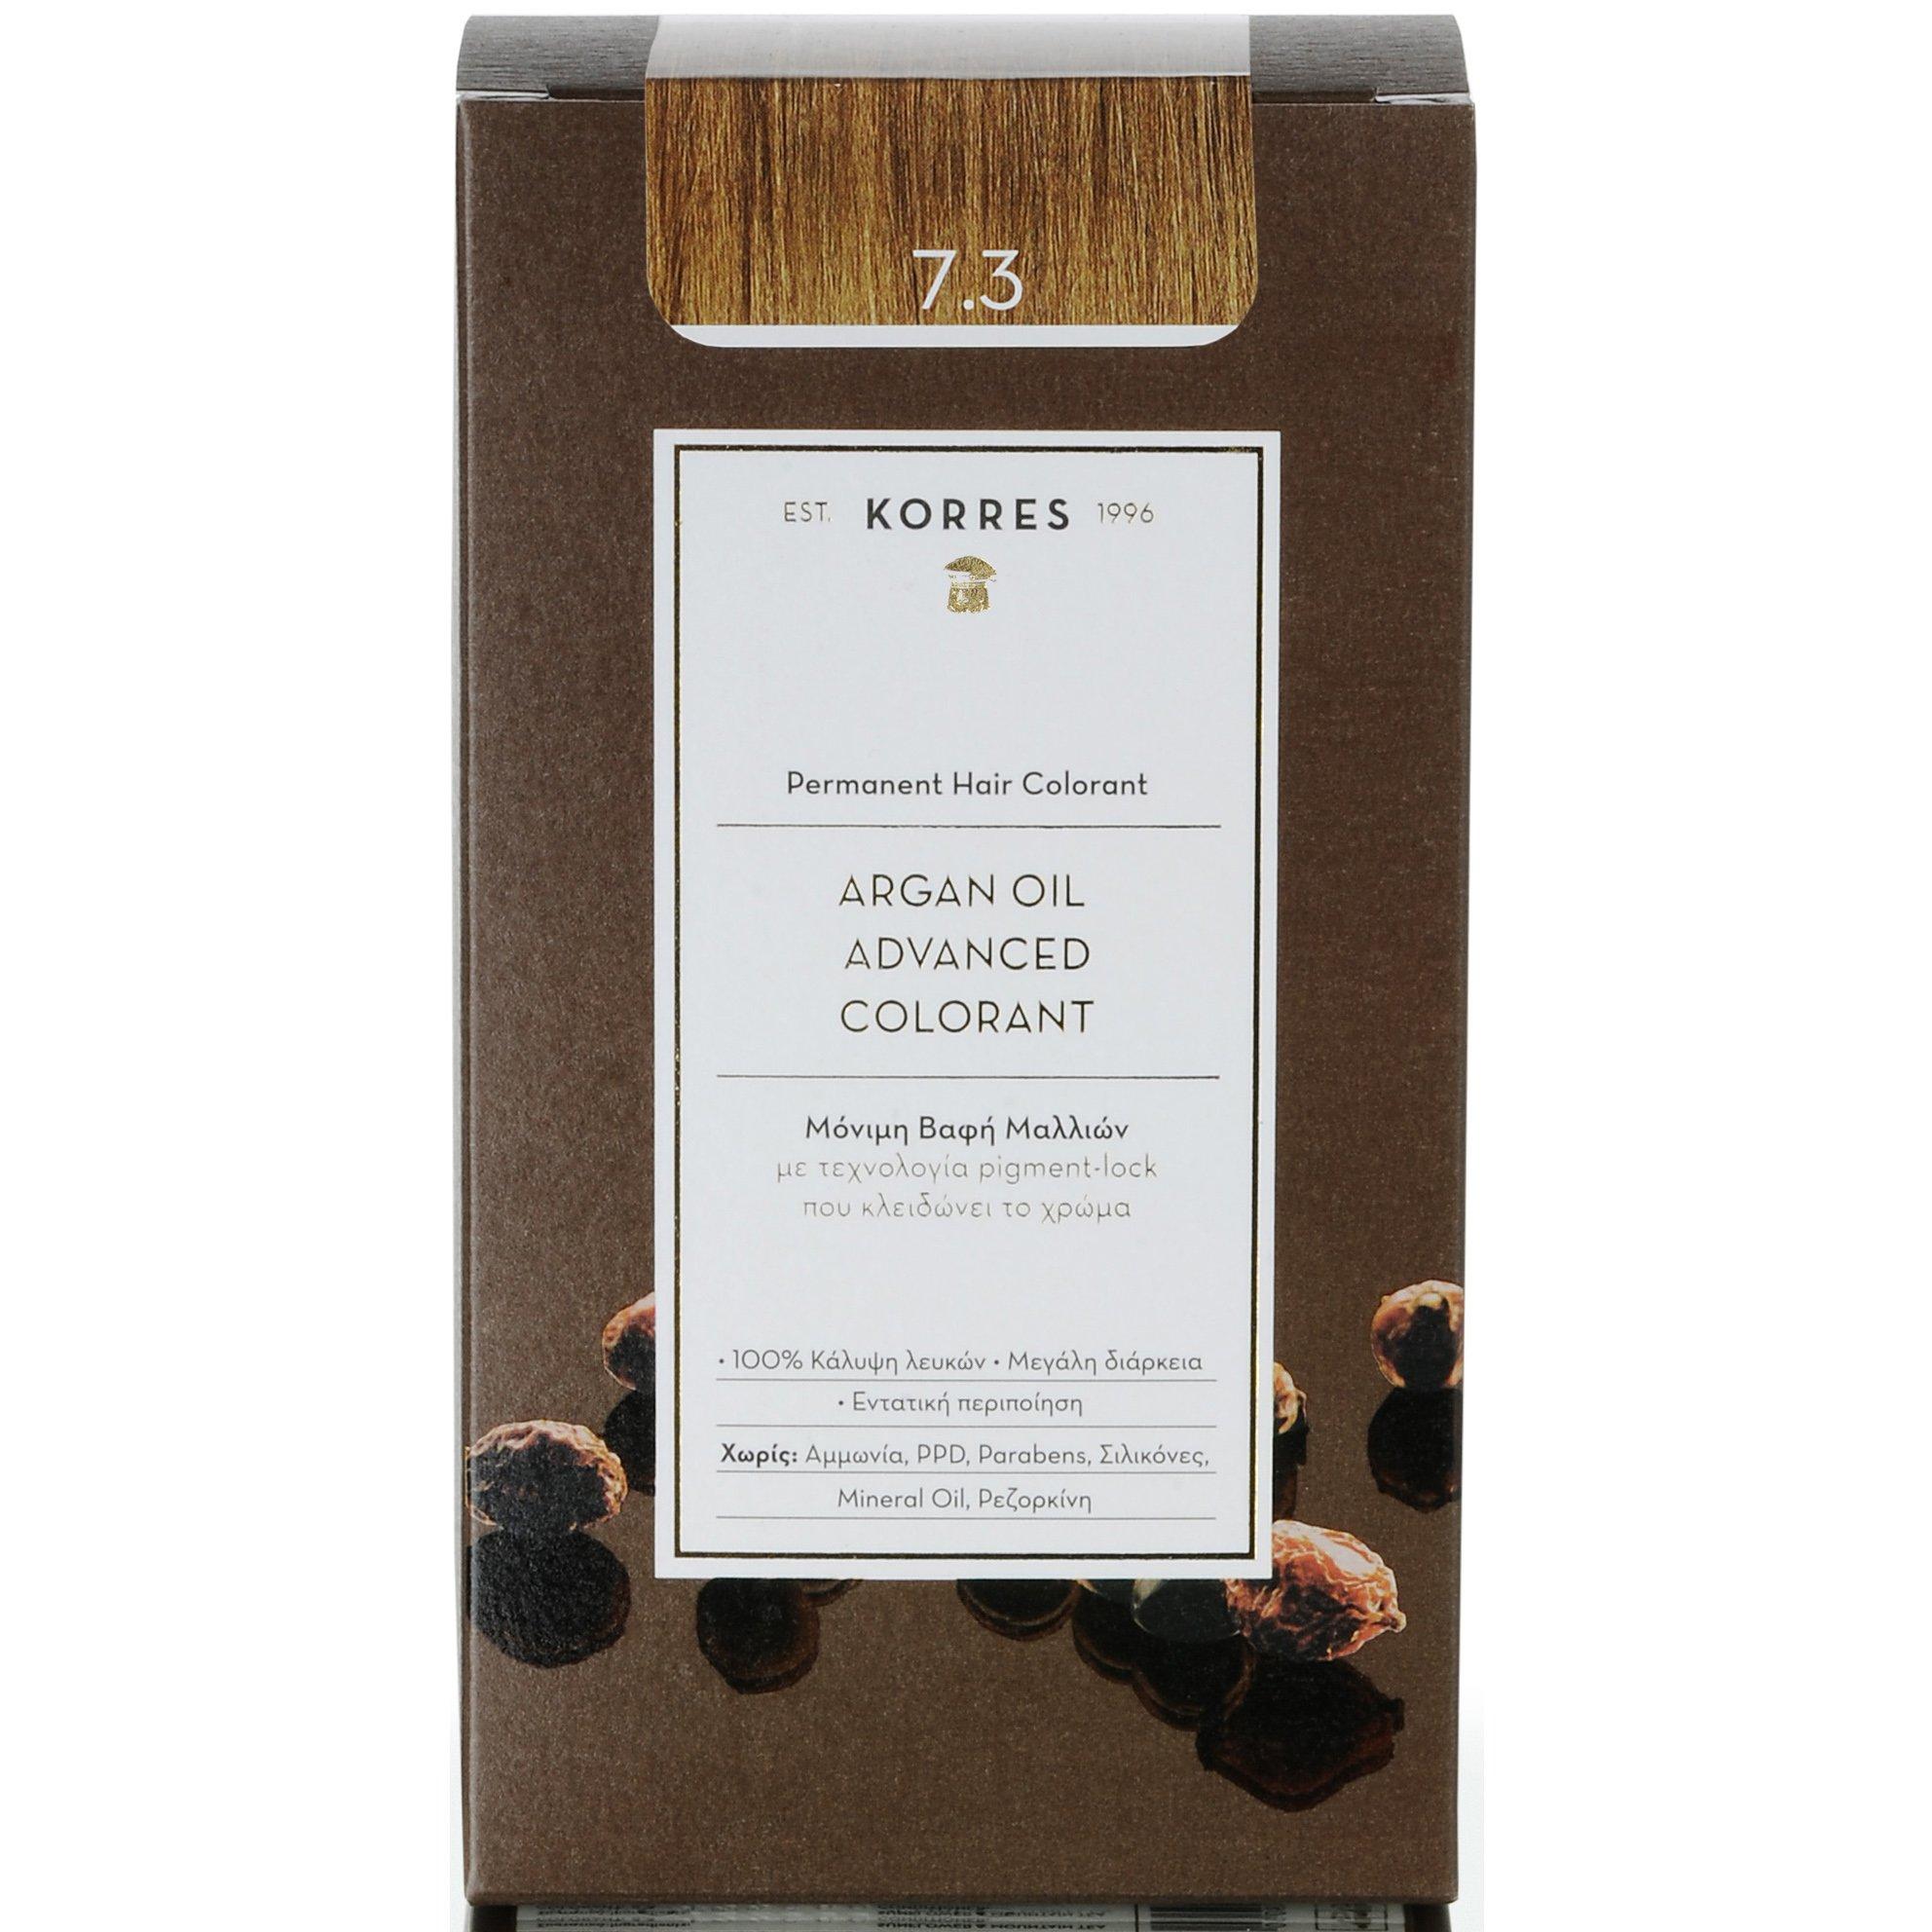 Korres Argan Oil Advanced Colorant Μόνιμη Βαφή Μαλλιών με Τεχνολογία Pigment-Lock που Κλειδώνει το Χρώμα 50ml – 7.3 ΞΑΝΘΟ ΜΕΛΙ